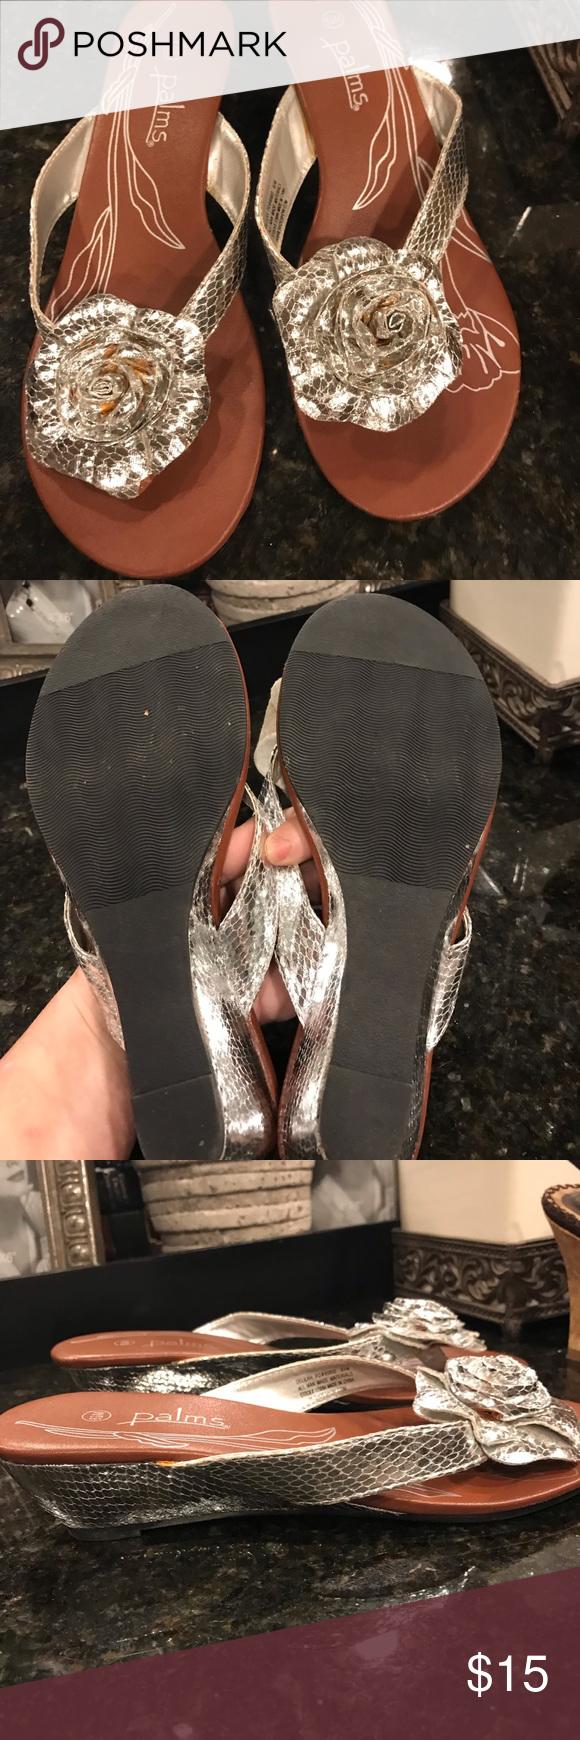 4d8c460e7bd318 PALMS shoe show wedge sandals Pre-owned silver DELILAH sandal wedges.  Center flower accent